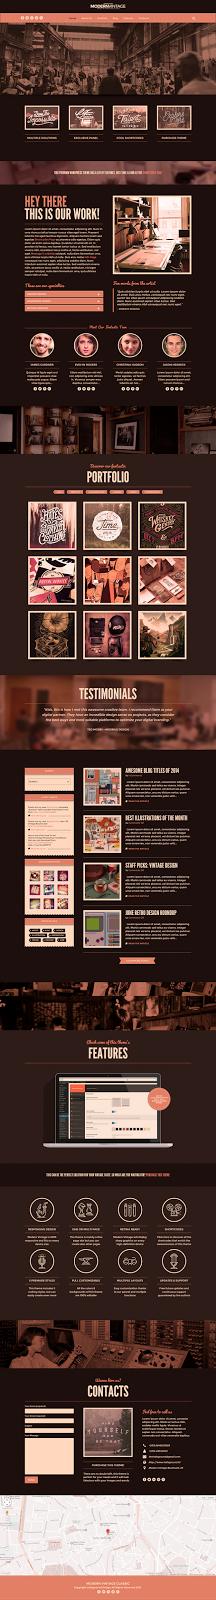 Premium Vintage Style Website Theme